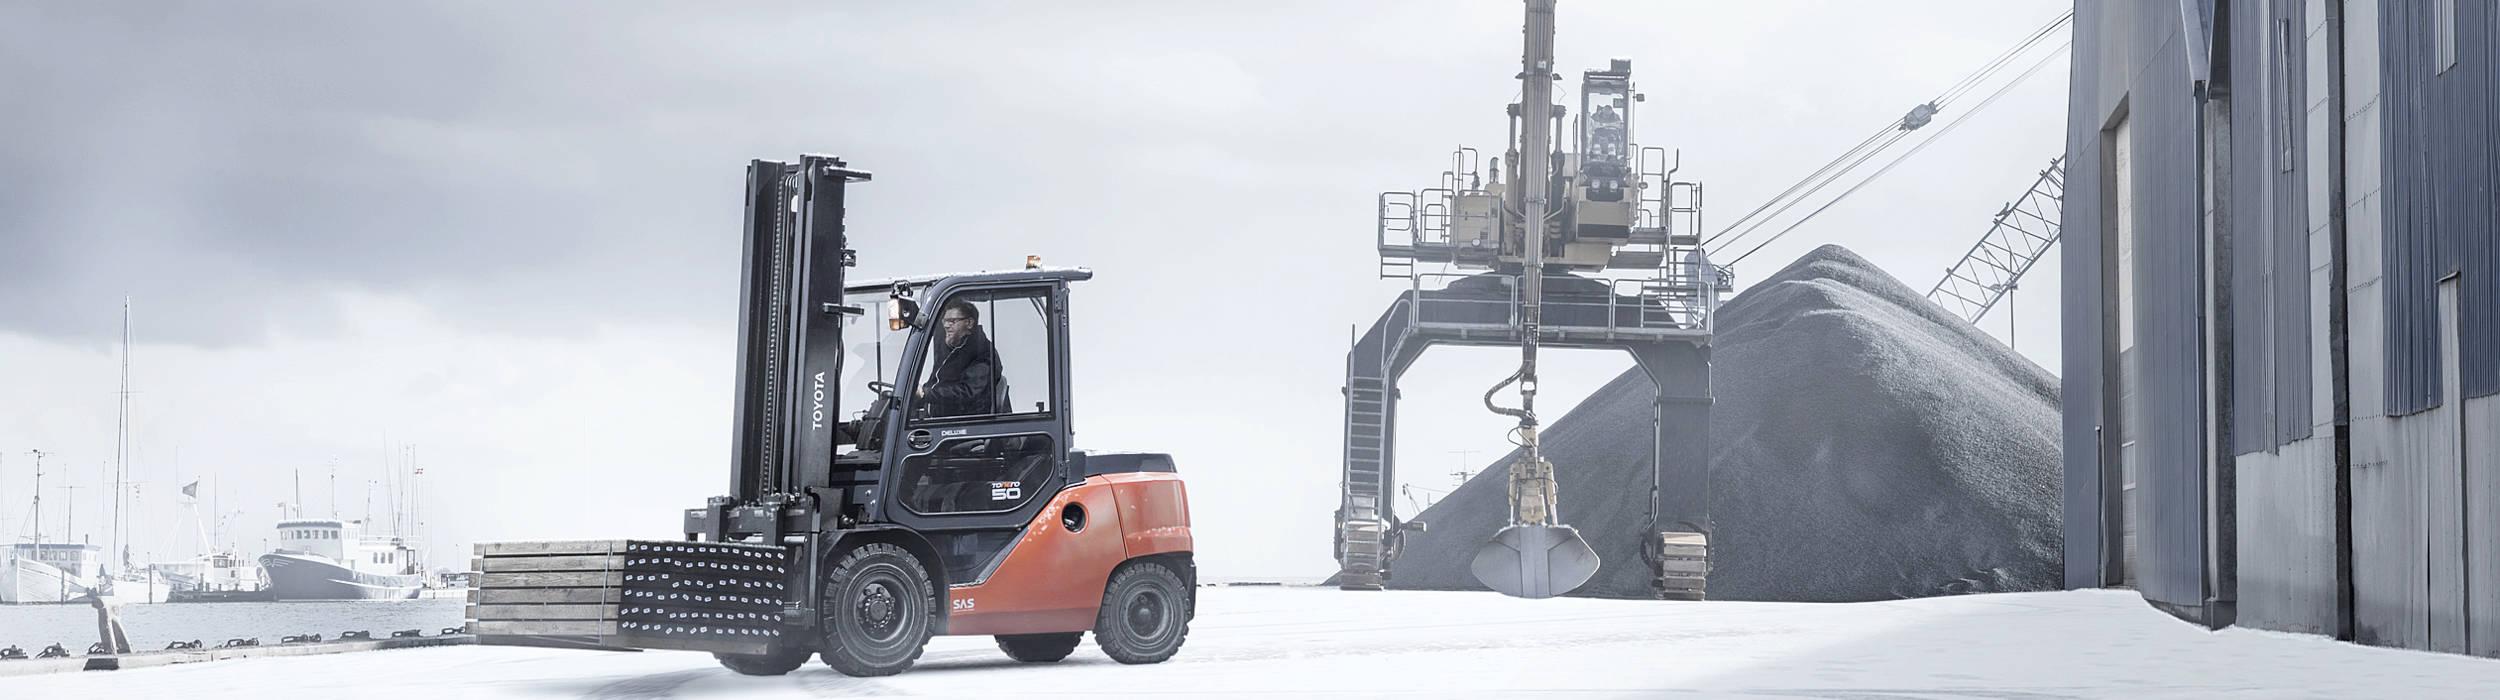 Beverage Toyota Tonero in winter